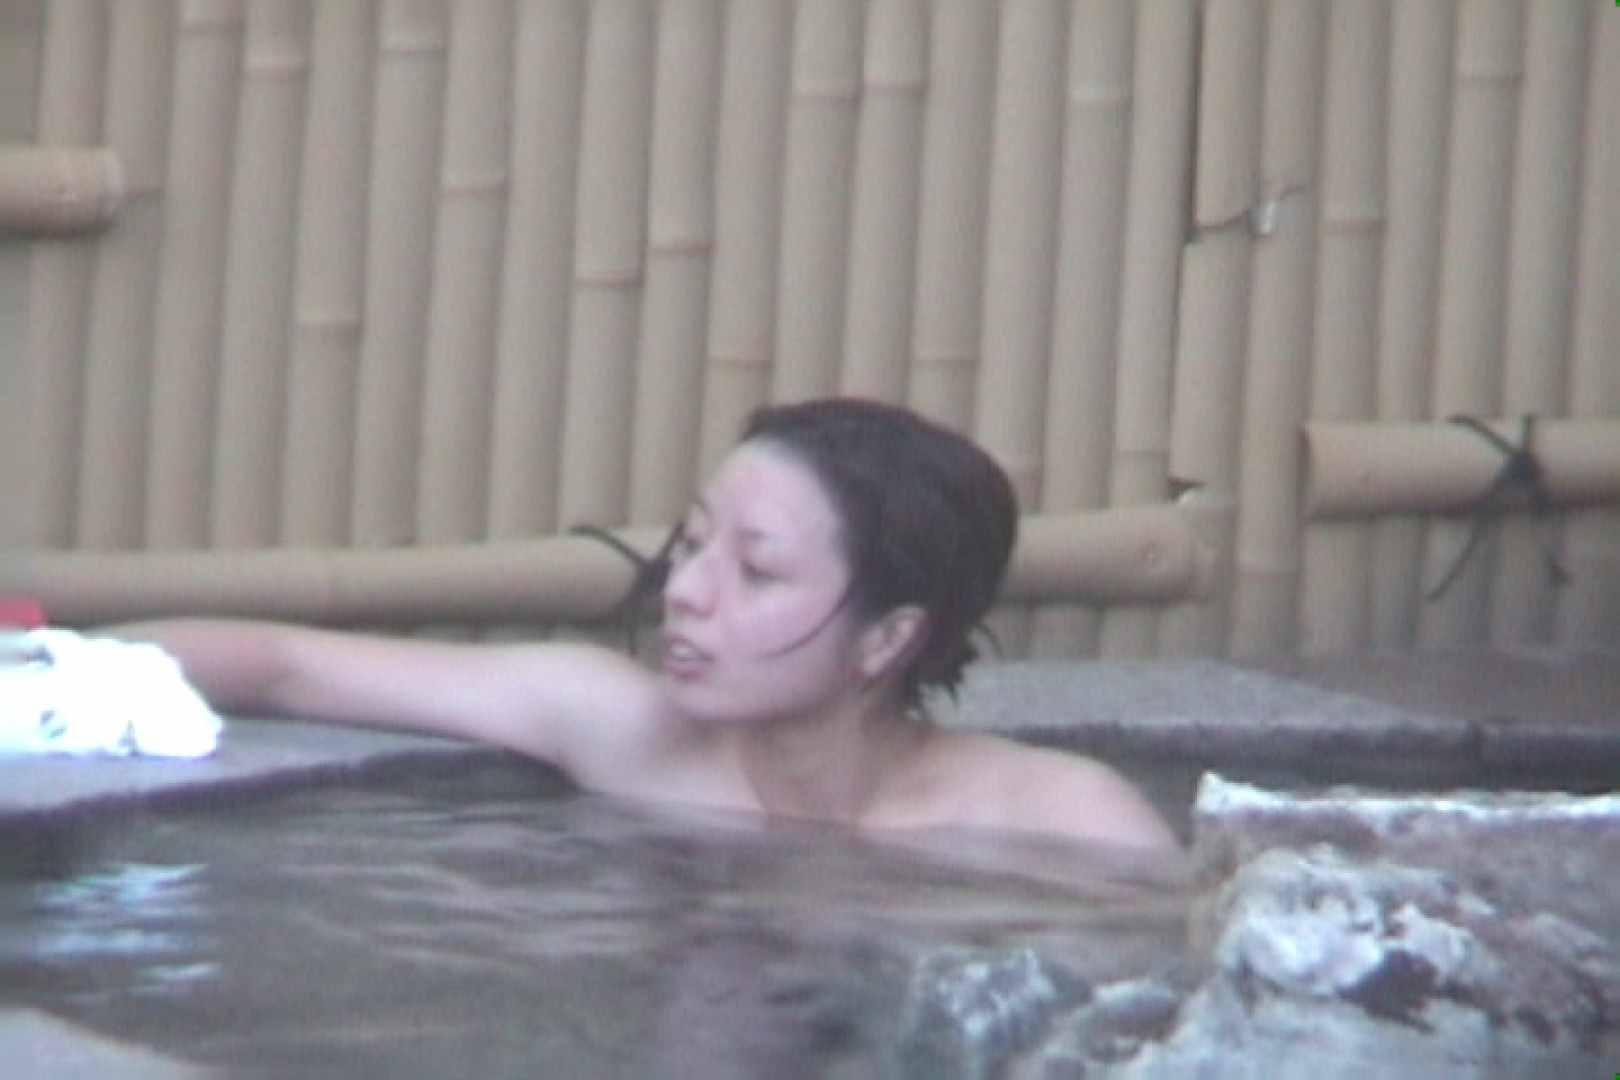 Aquaな露天風呂Vol.608 美しいOLの裸体 AV動画キャプチャ 95pic 62